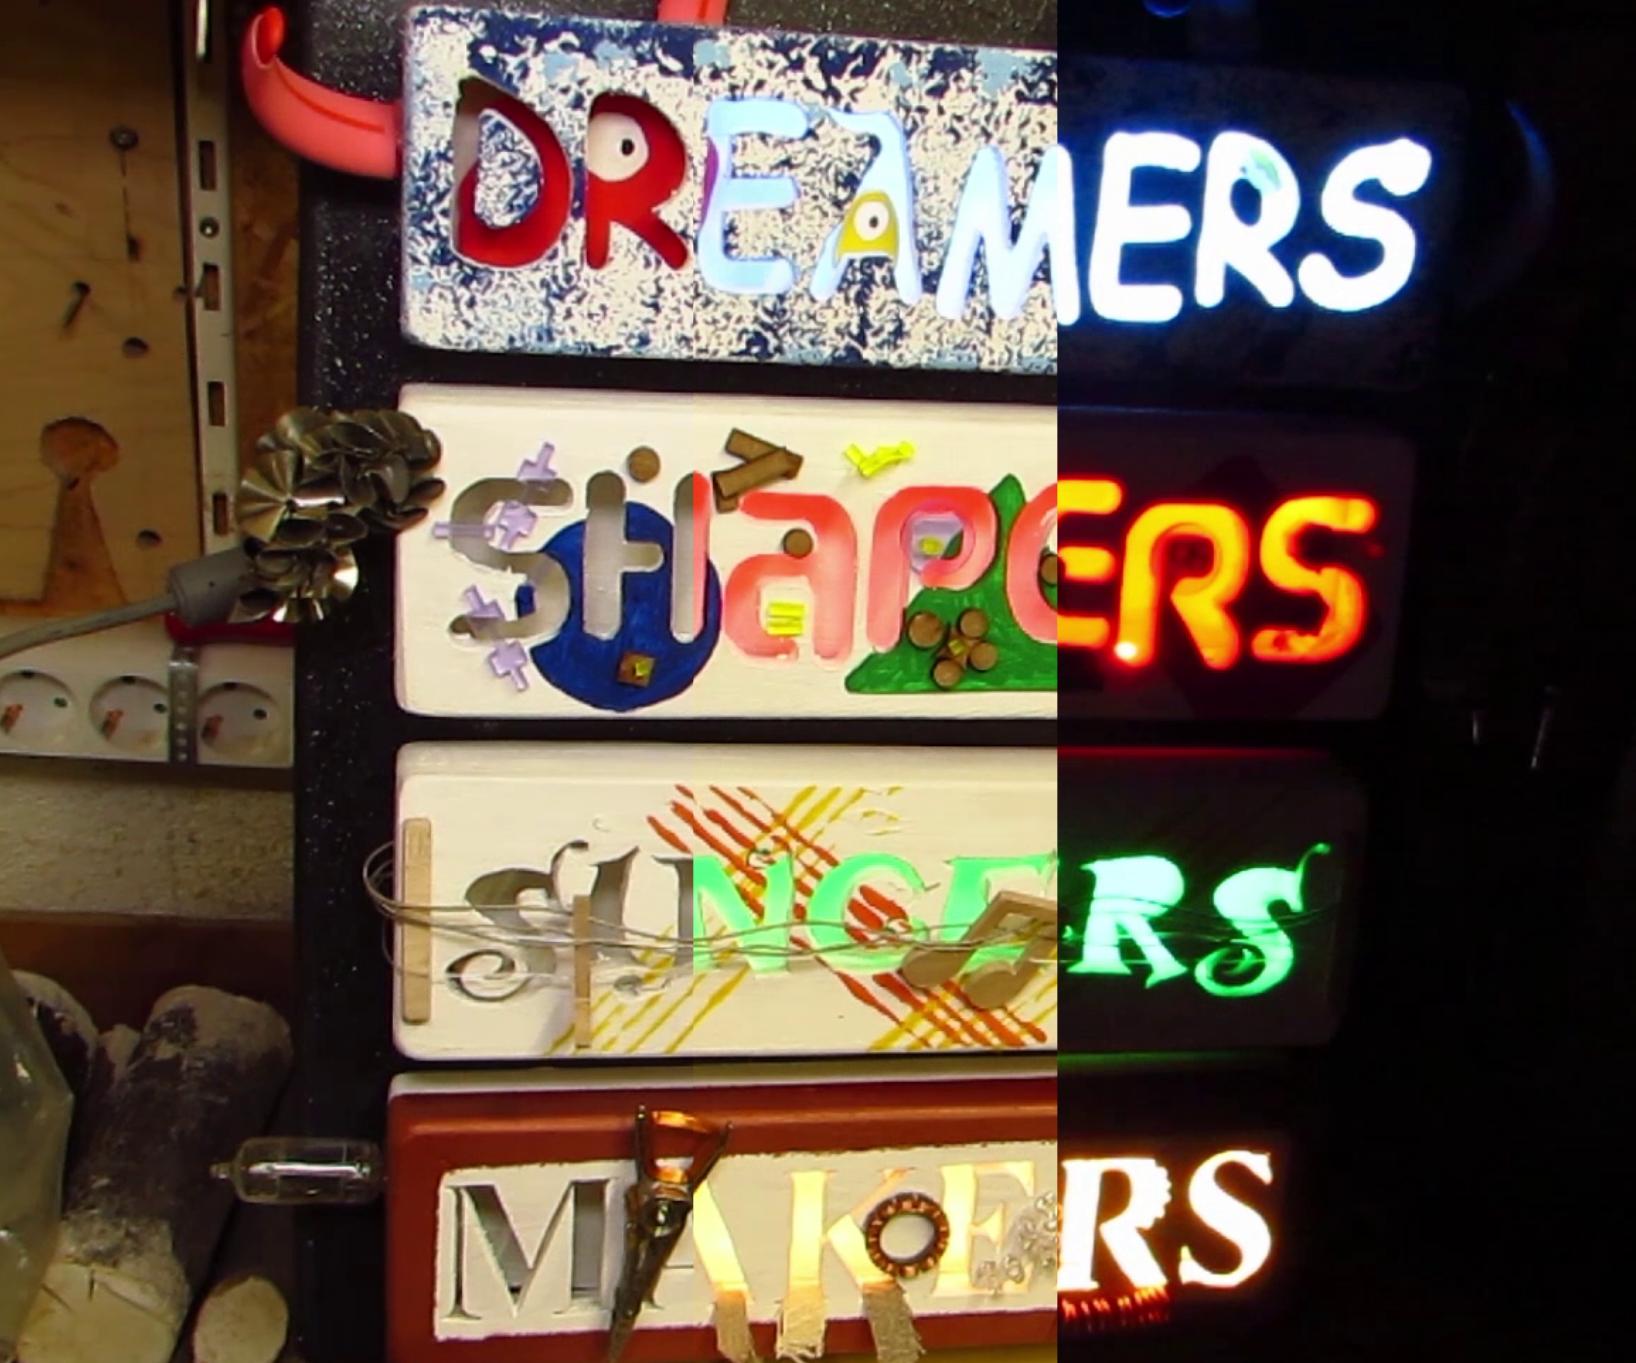 Dreamers, Shapers, Singers, Makers